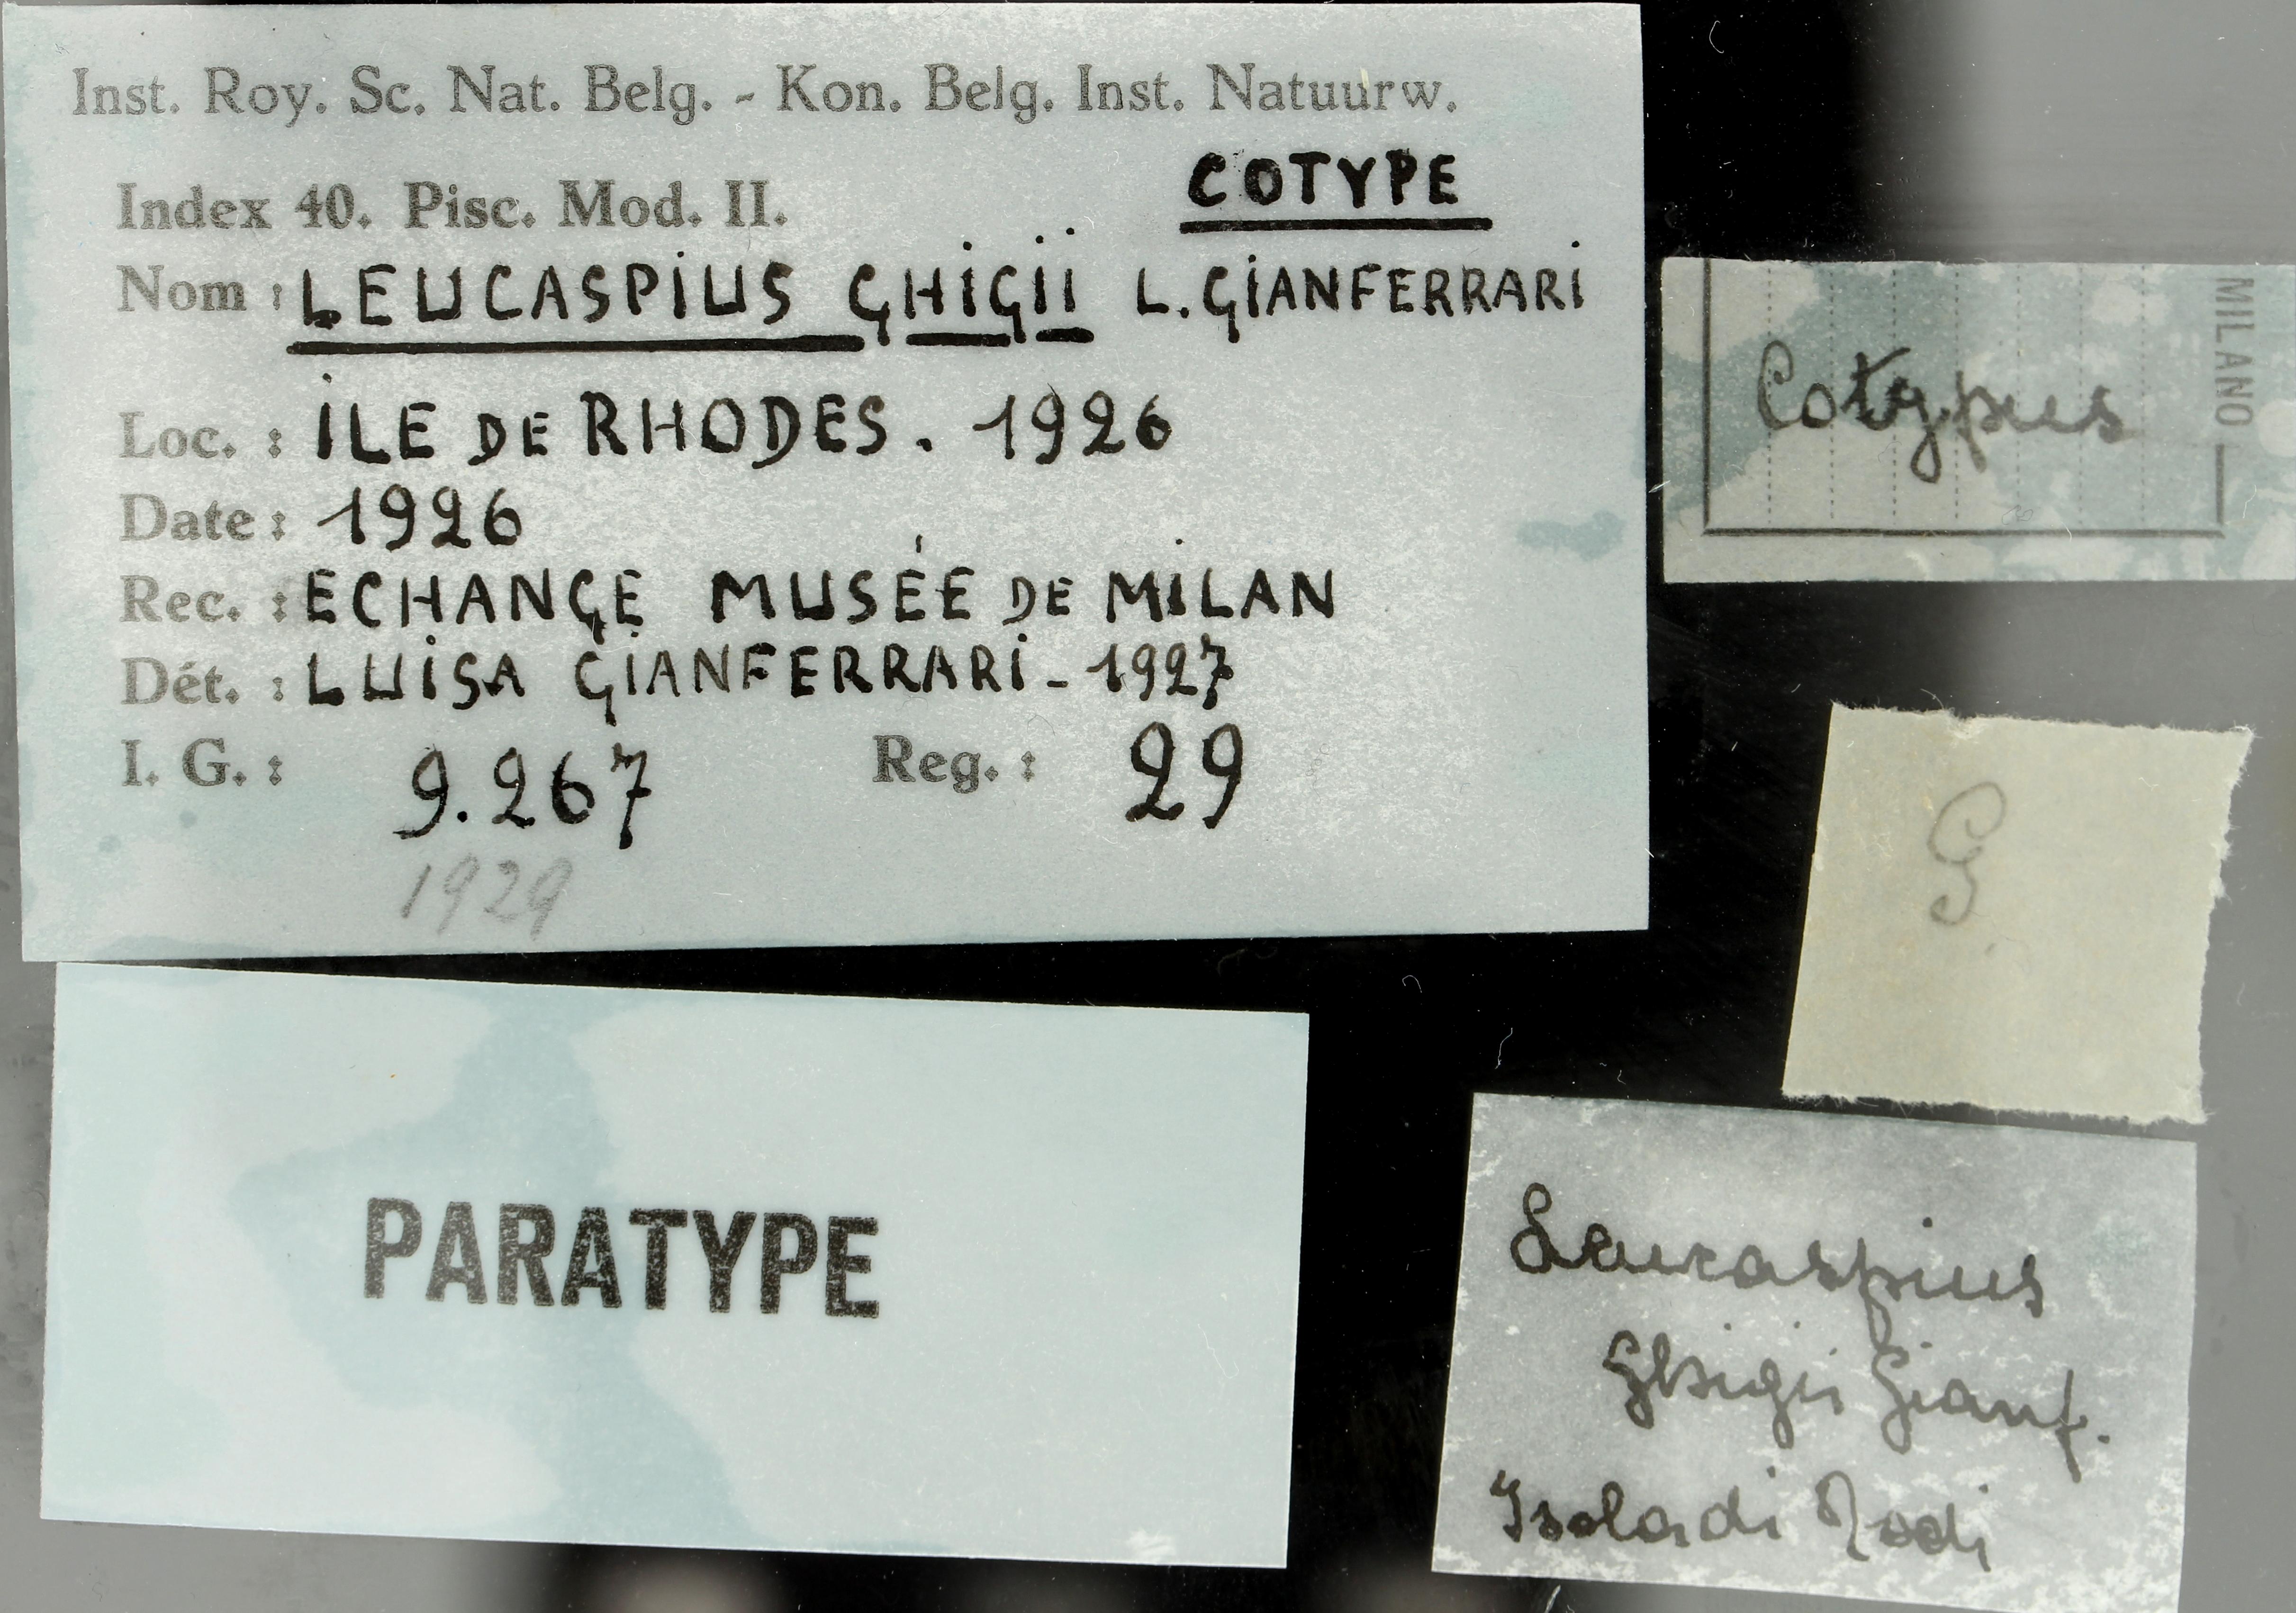 29 Leucaspius ghigii 9267 ticket.jpg